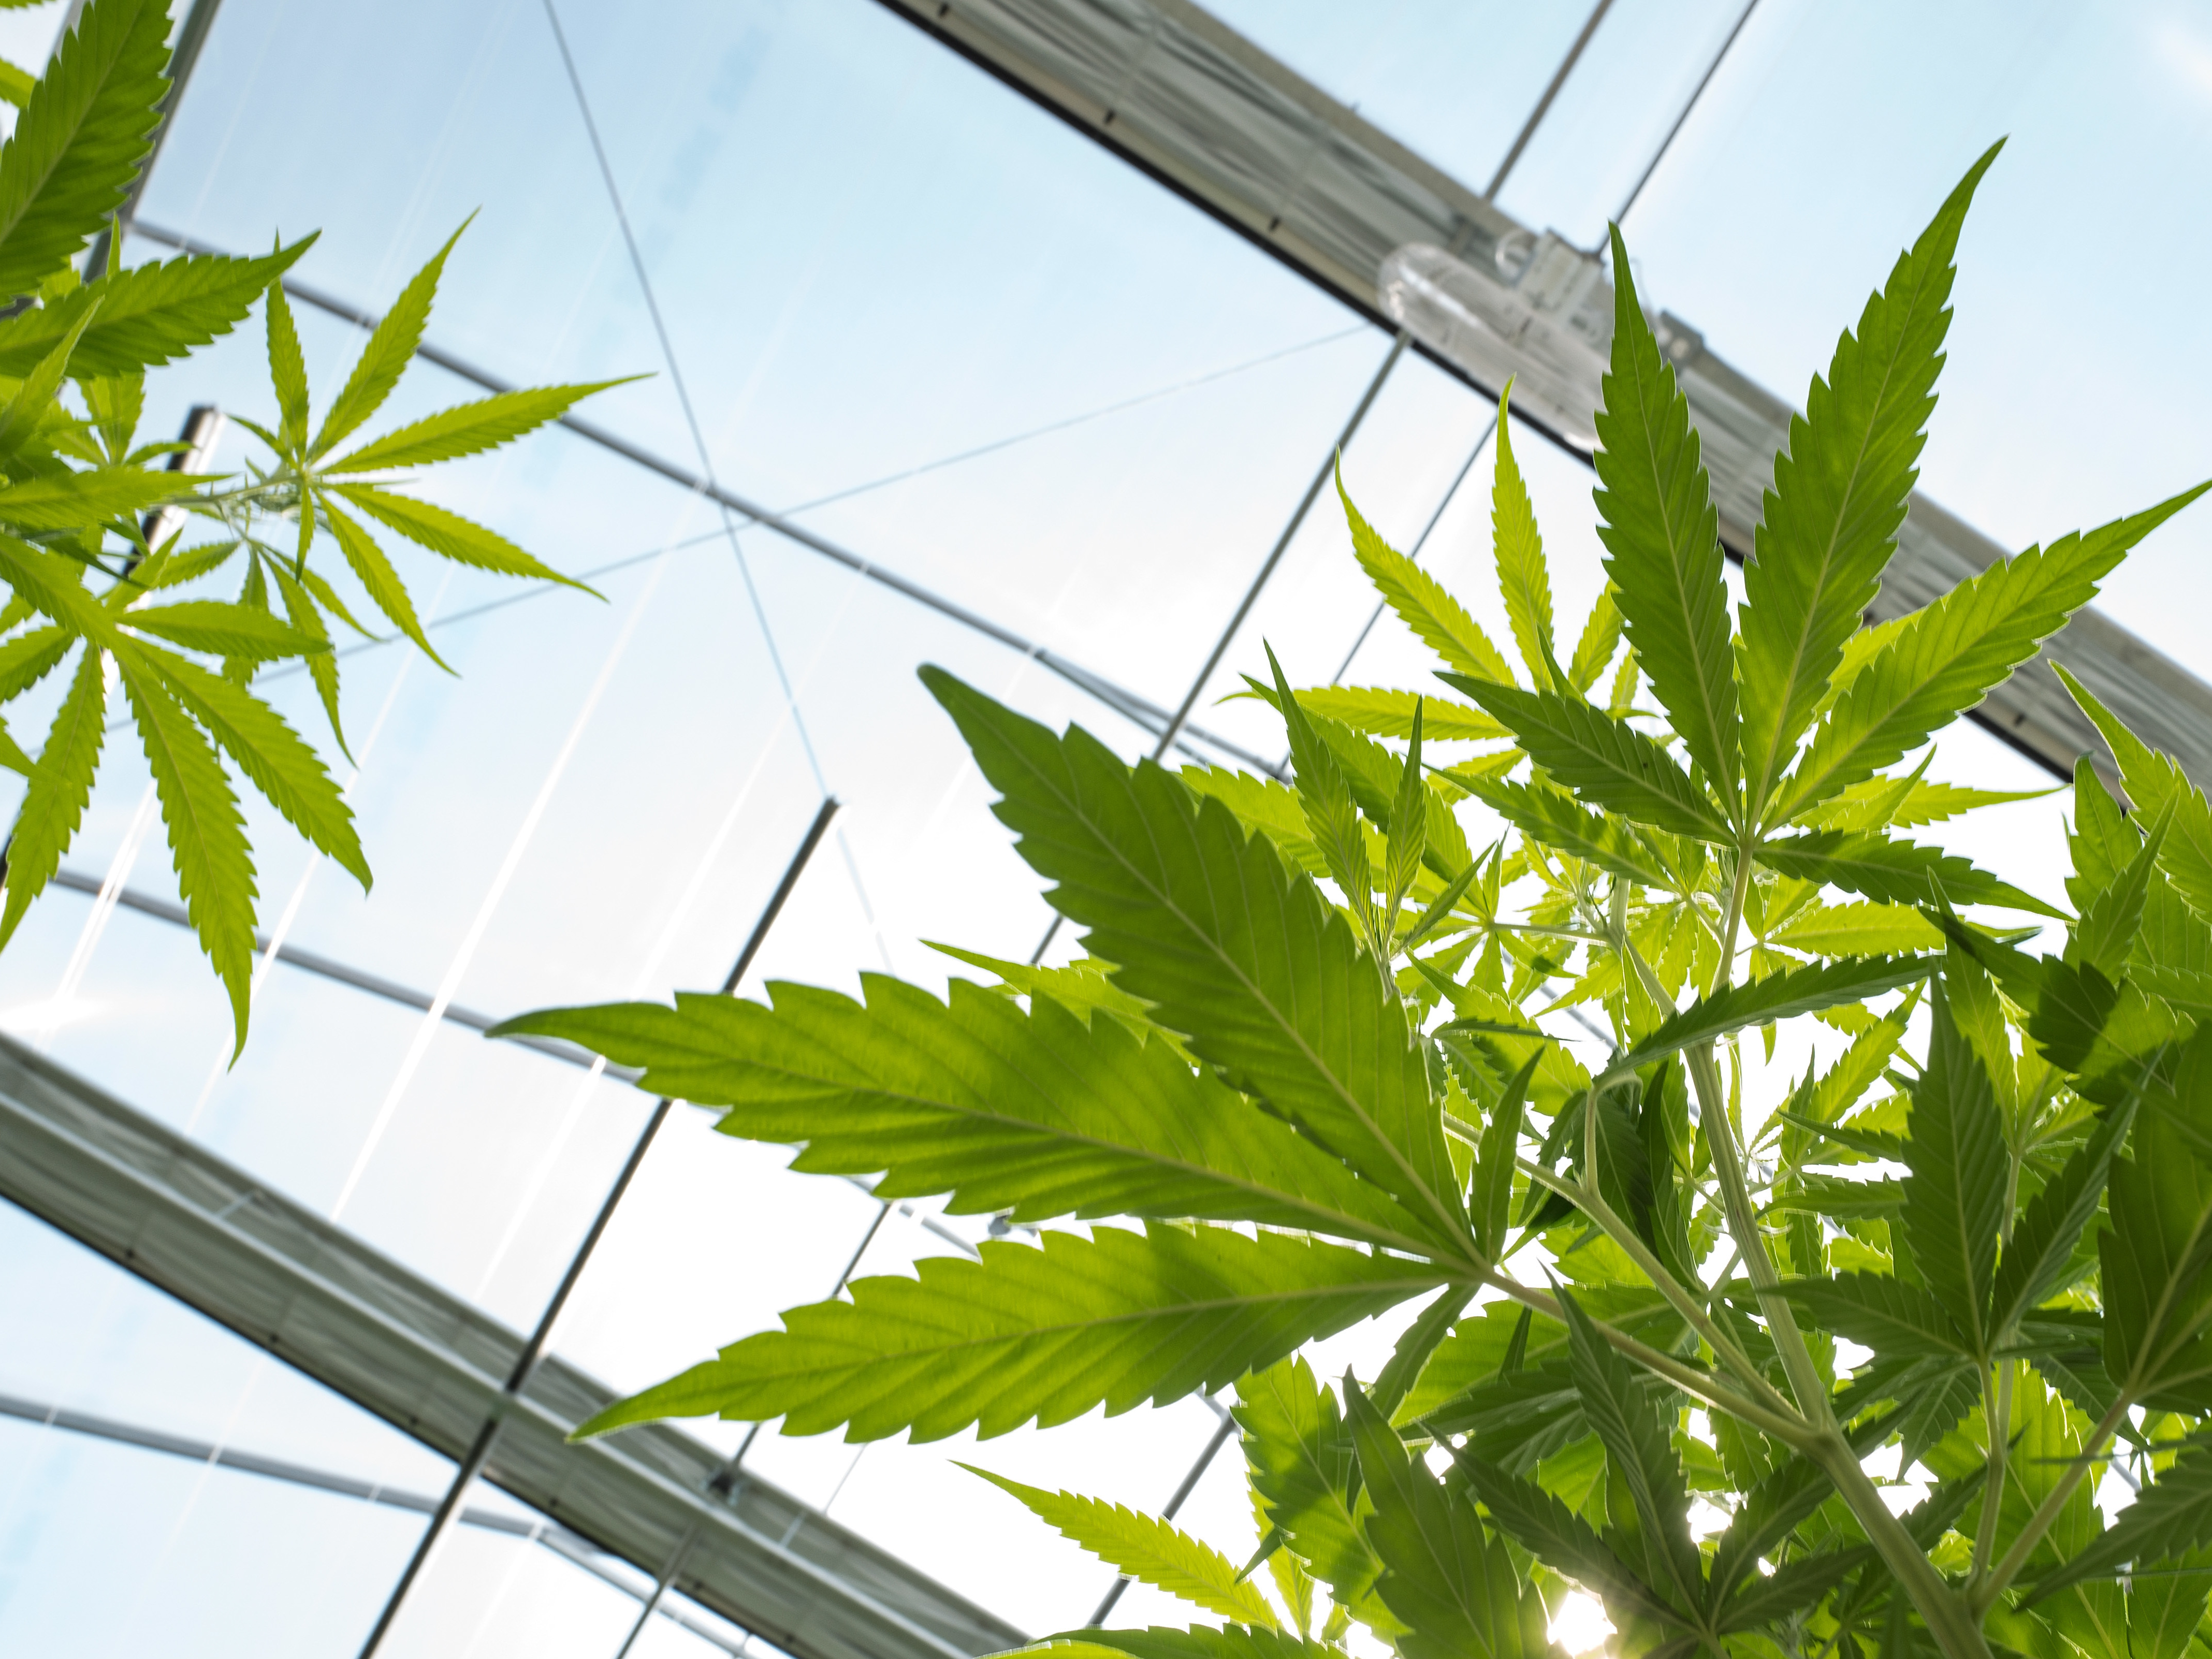 Local legislators divided on pot legalization measure Prop. 64